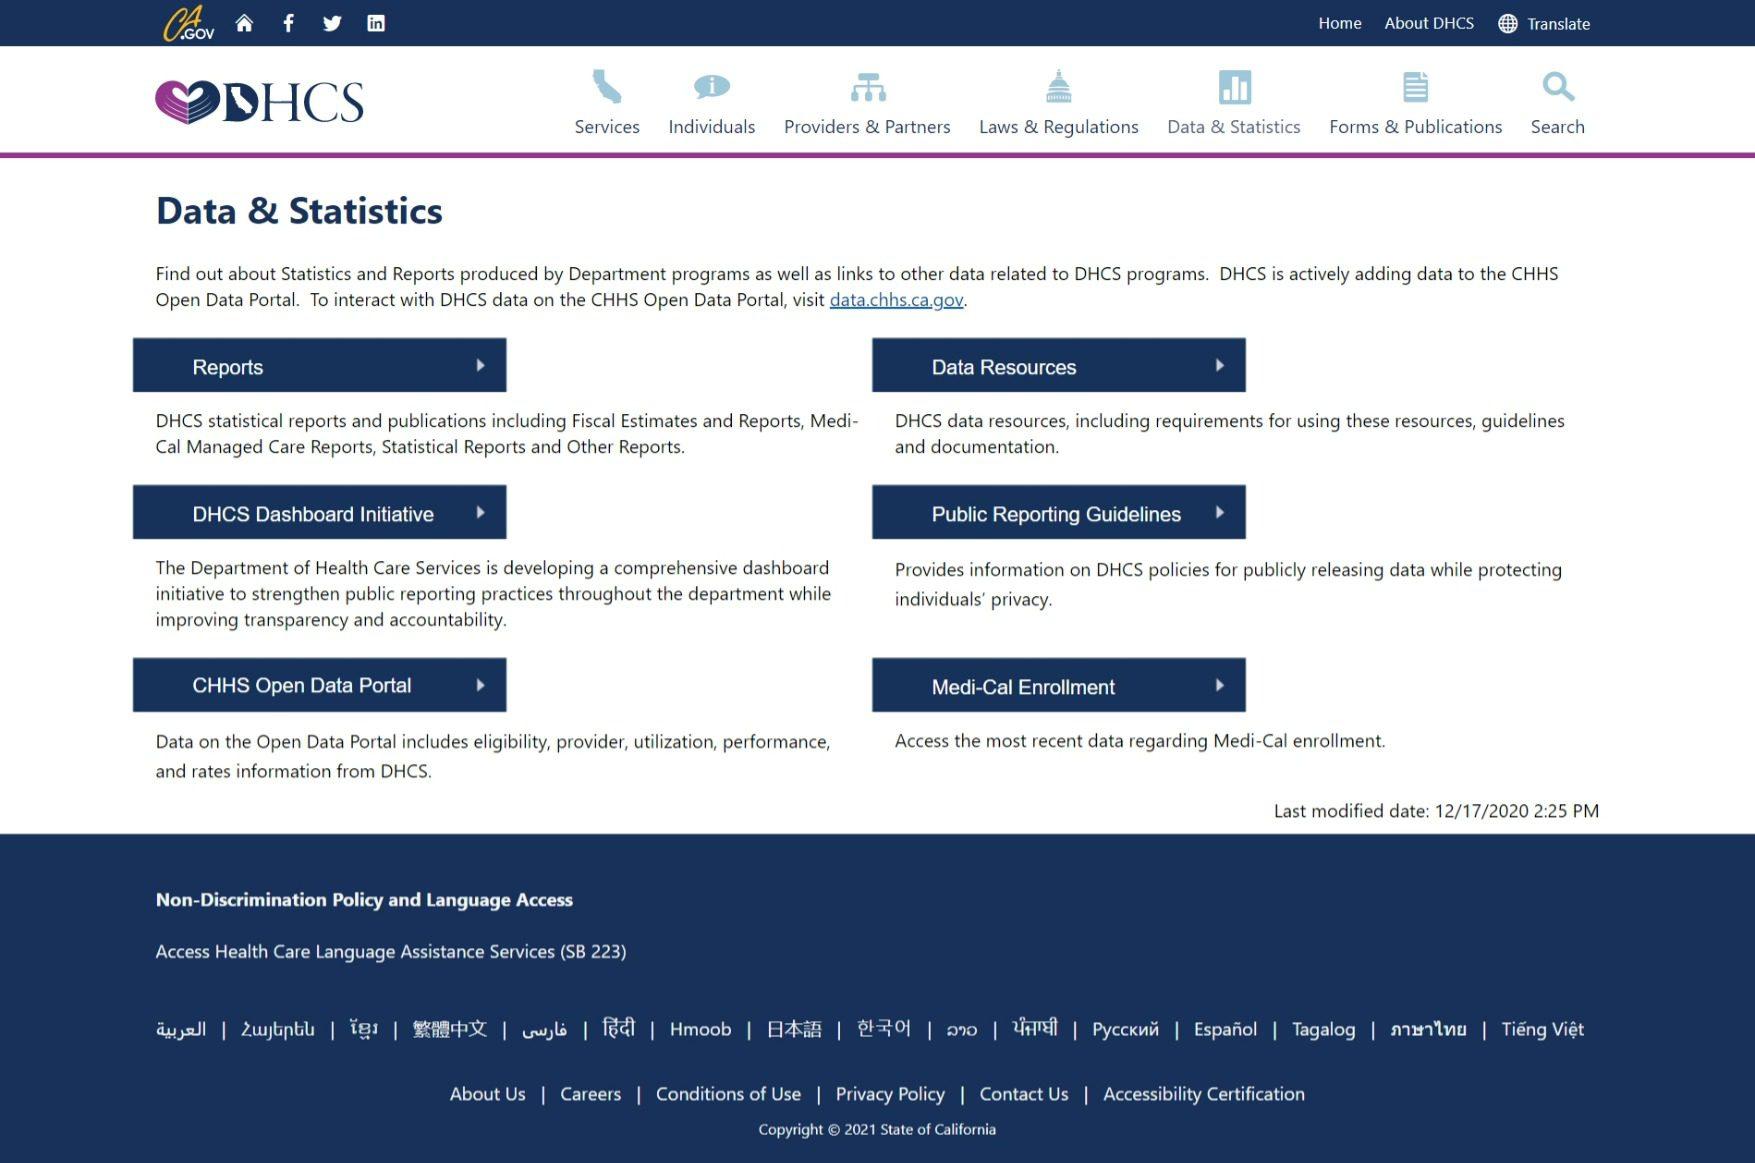 Data & Statistics